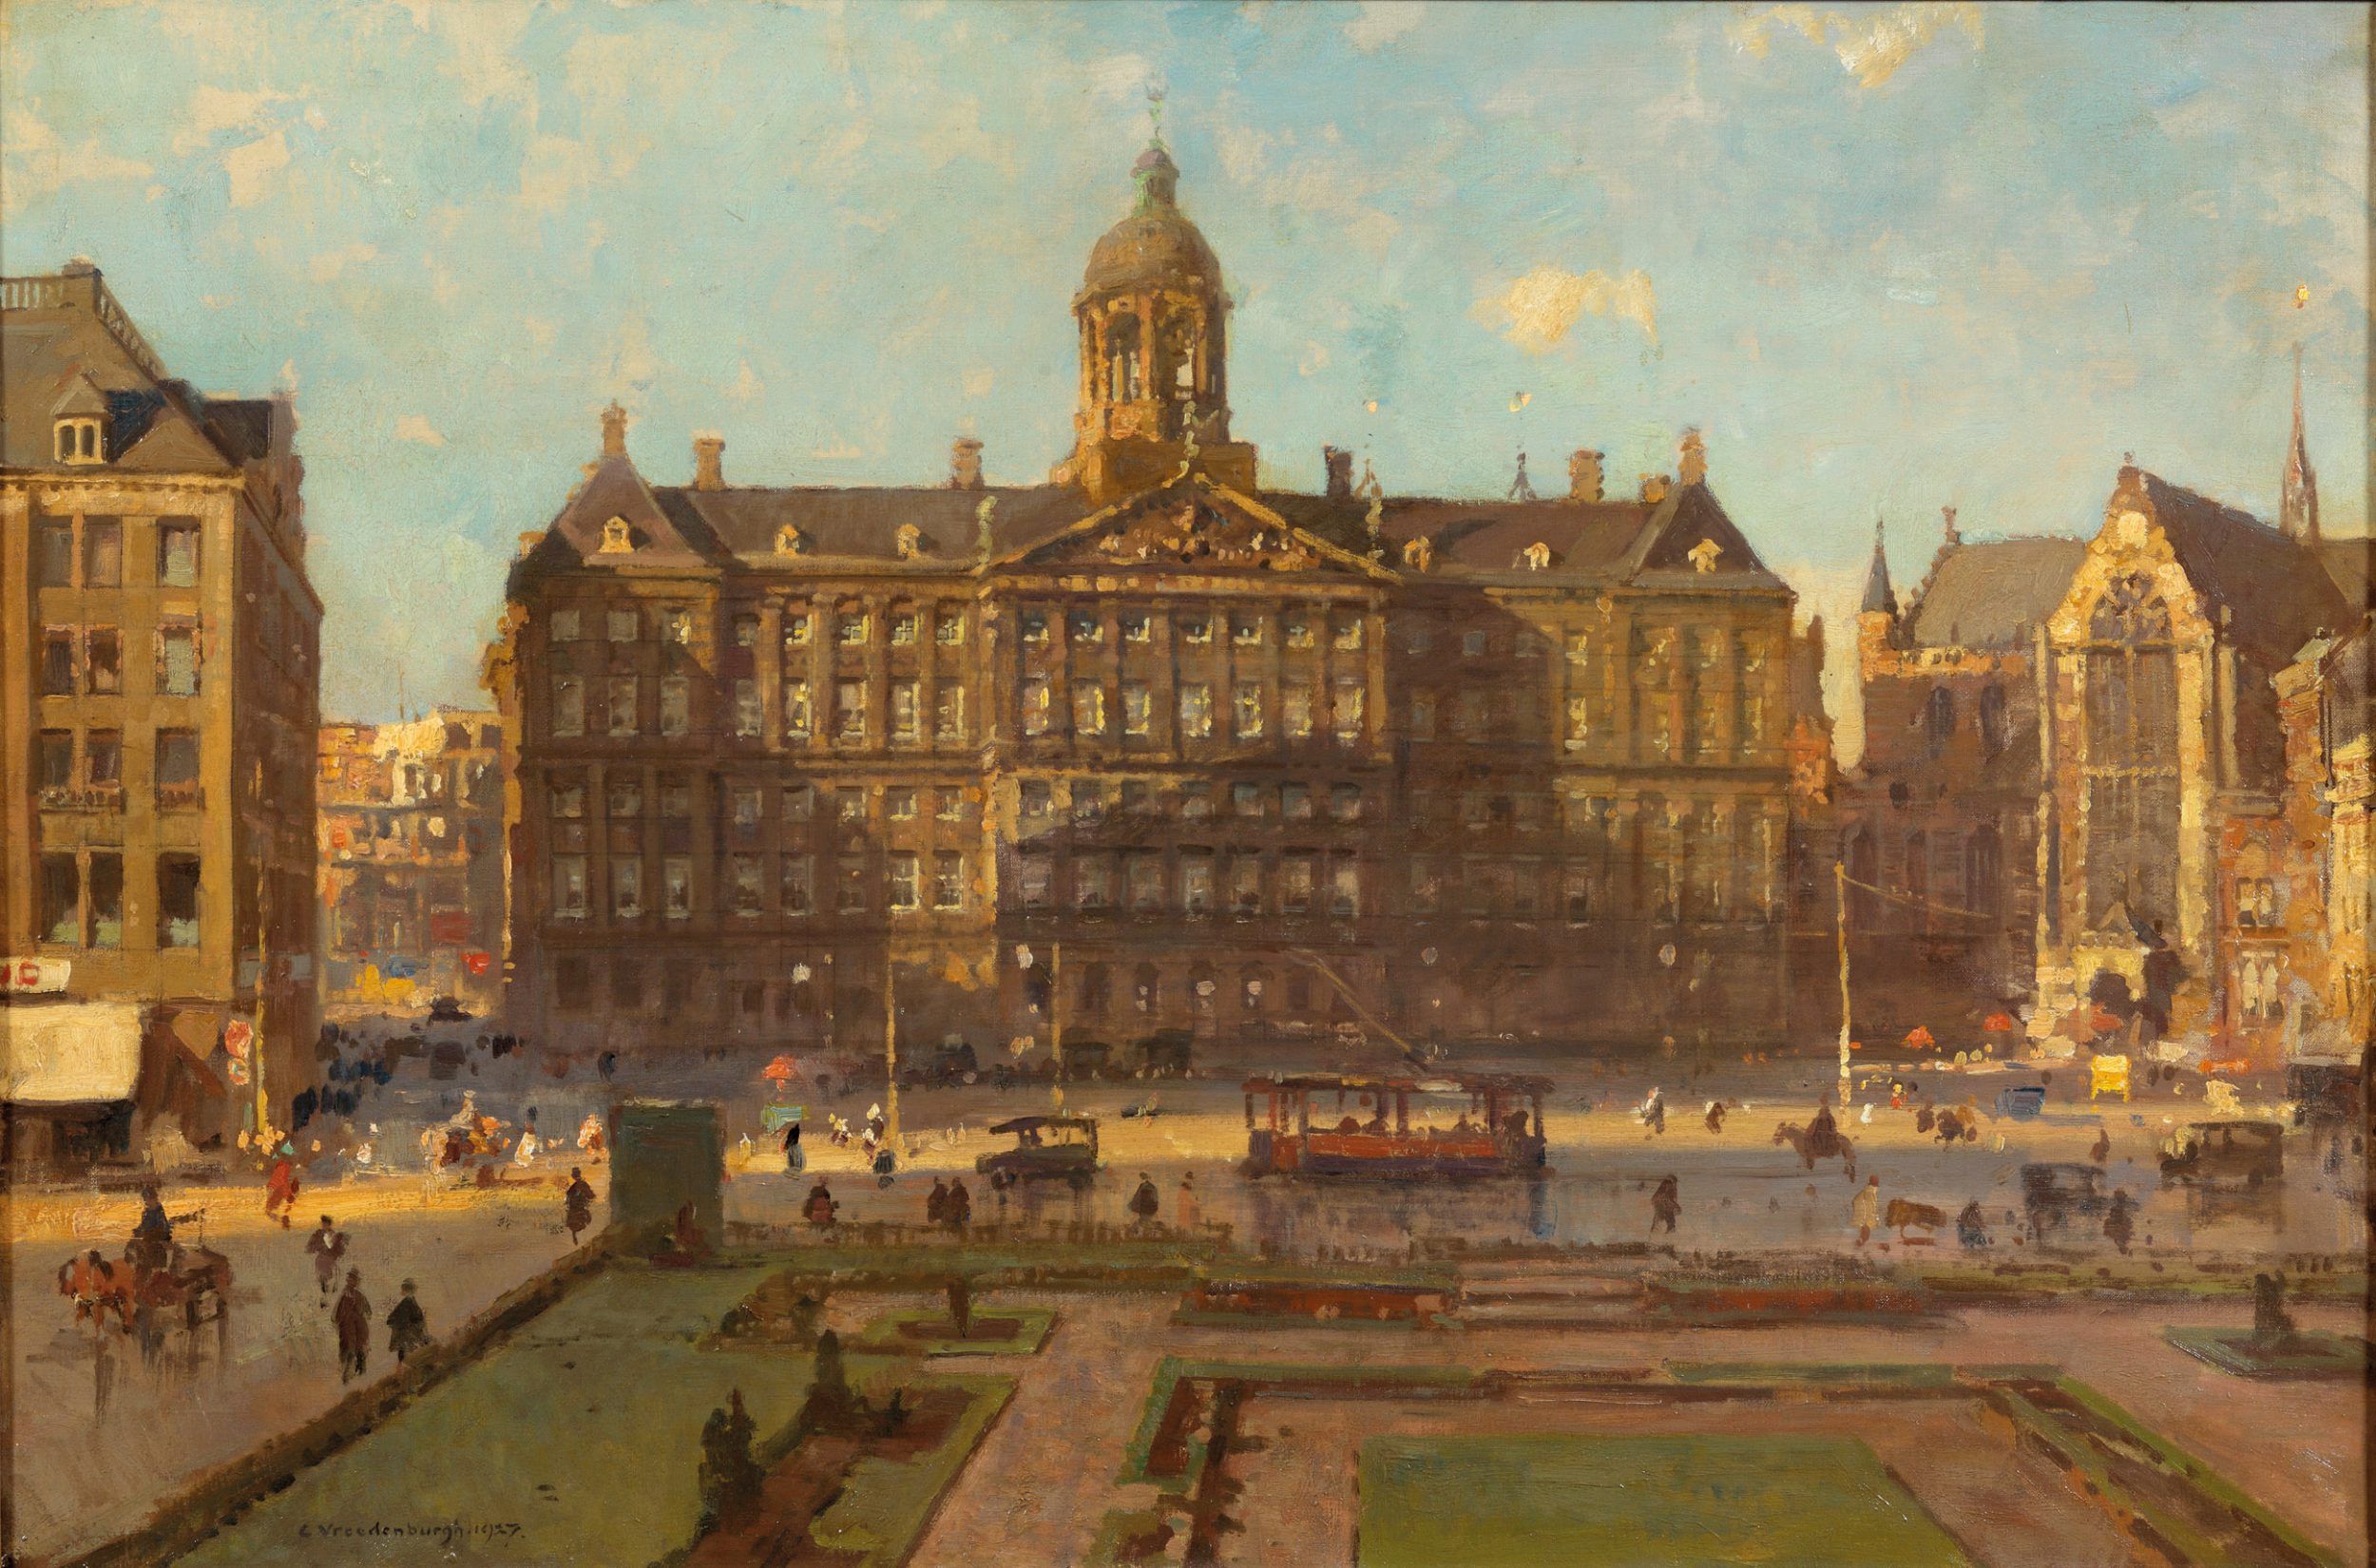 The Royal Palace – Amsterdam